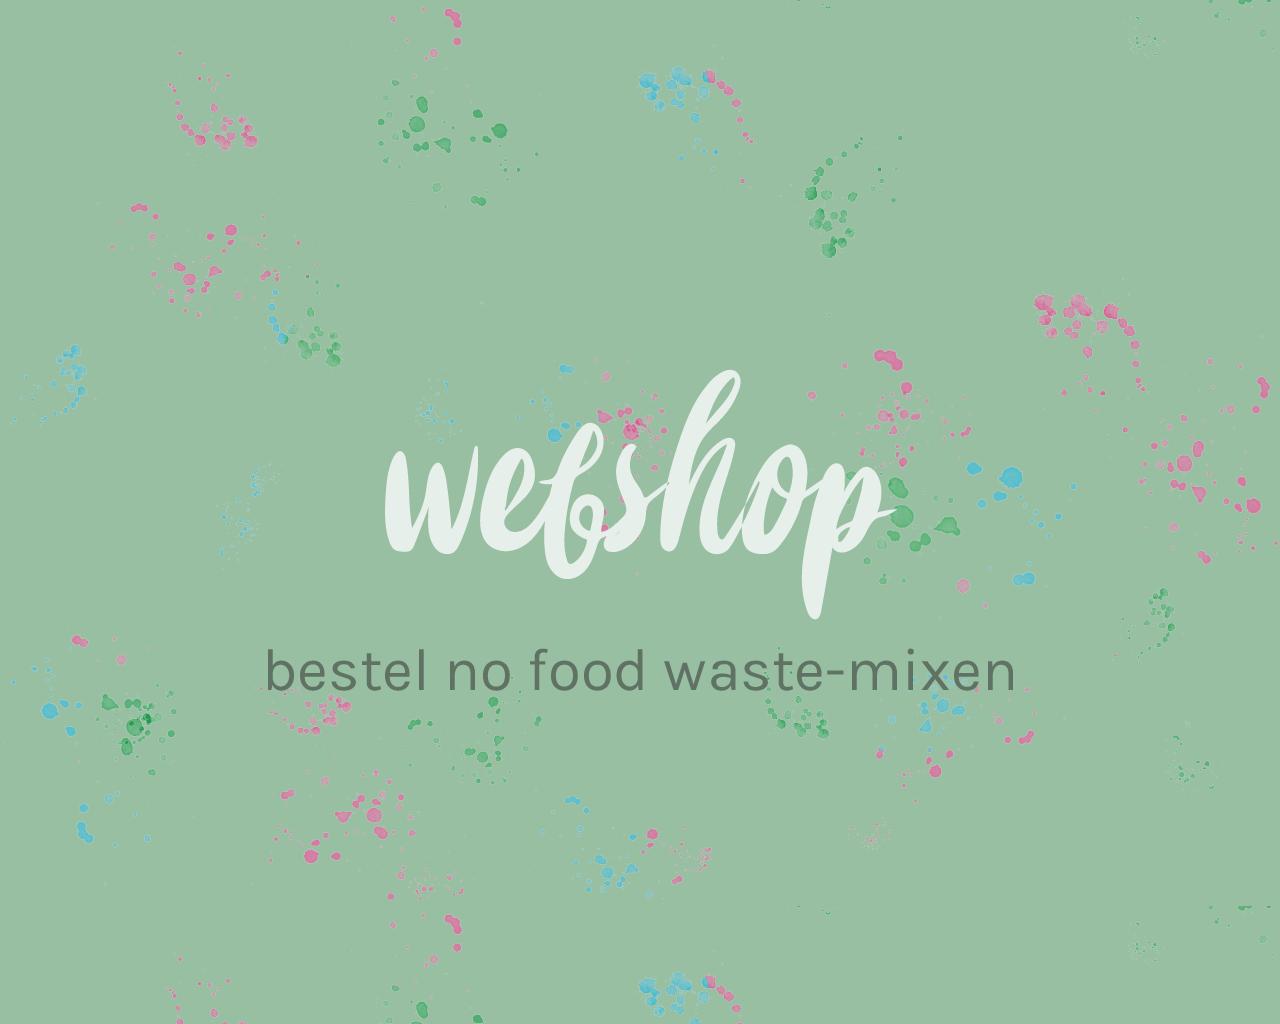 bestel no food waste mixen